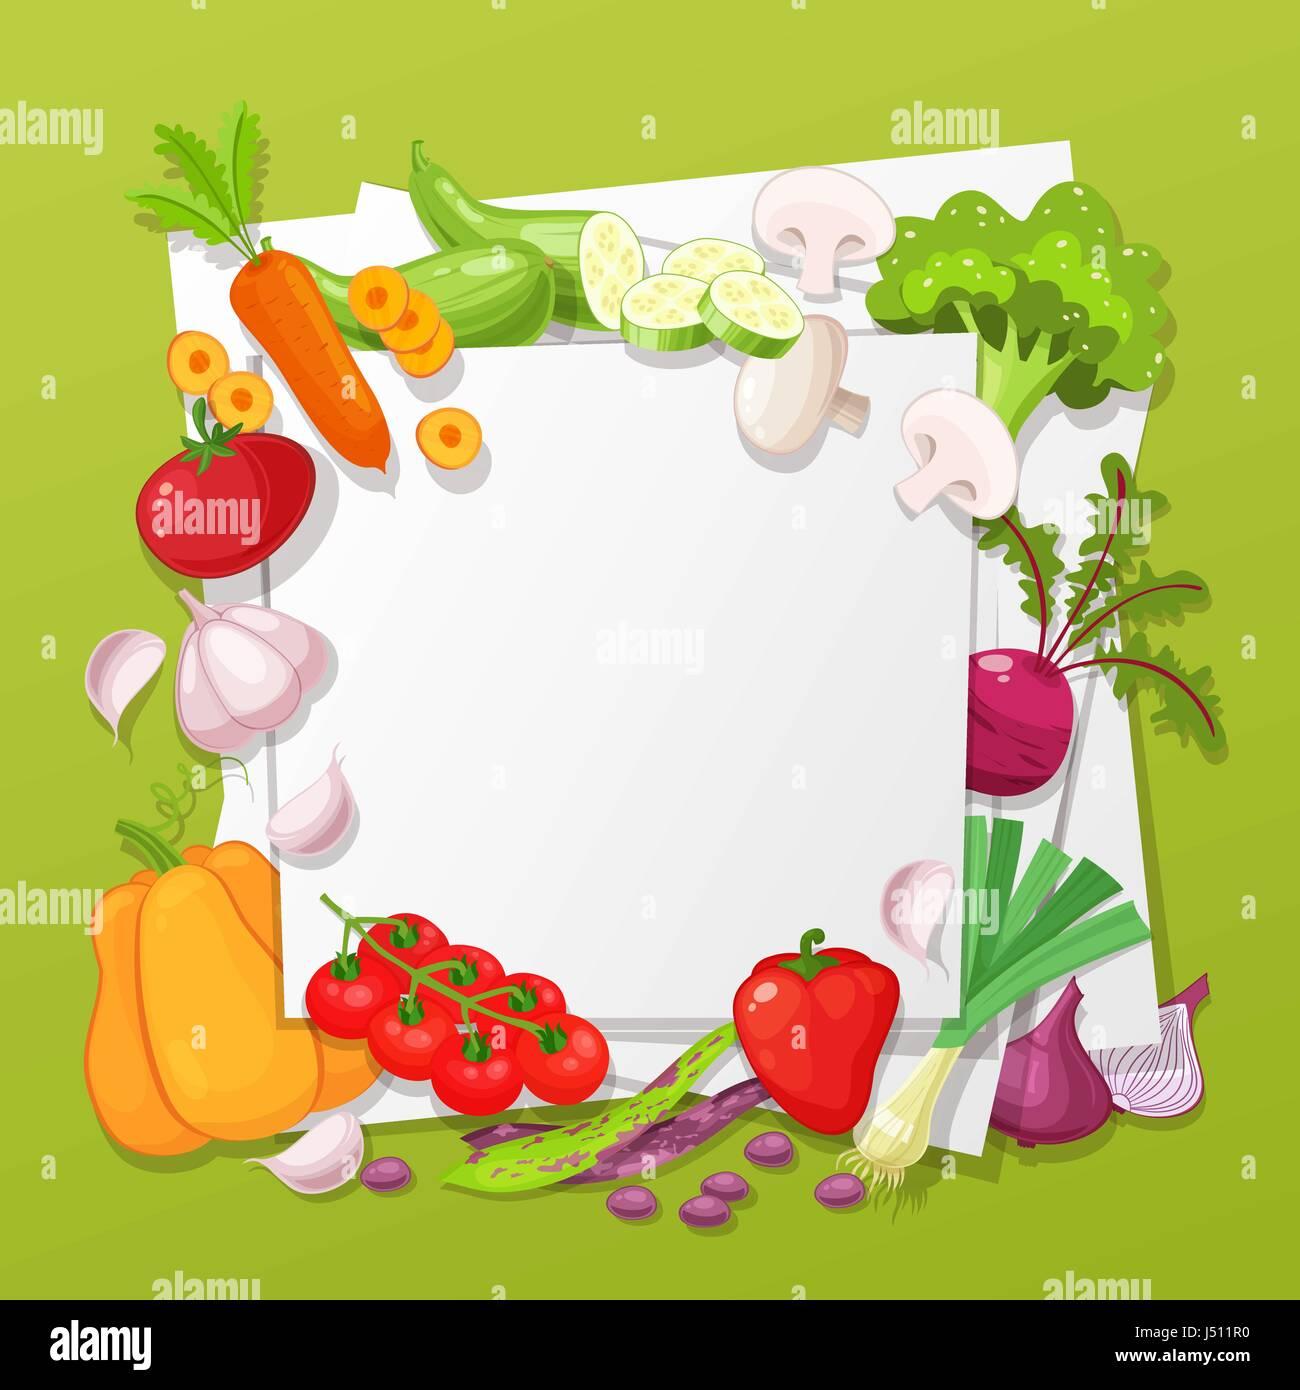 Vegetables top view frame. Farmers market menu design. Organic food poster. Vintage hand drawn sketch vector illustration. - Stock Vector